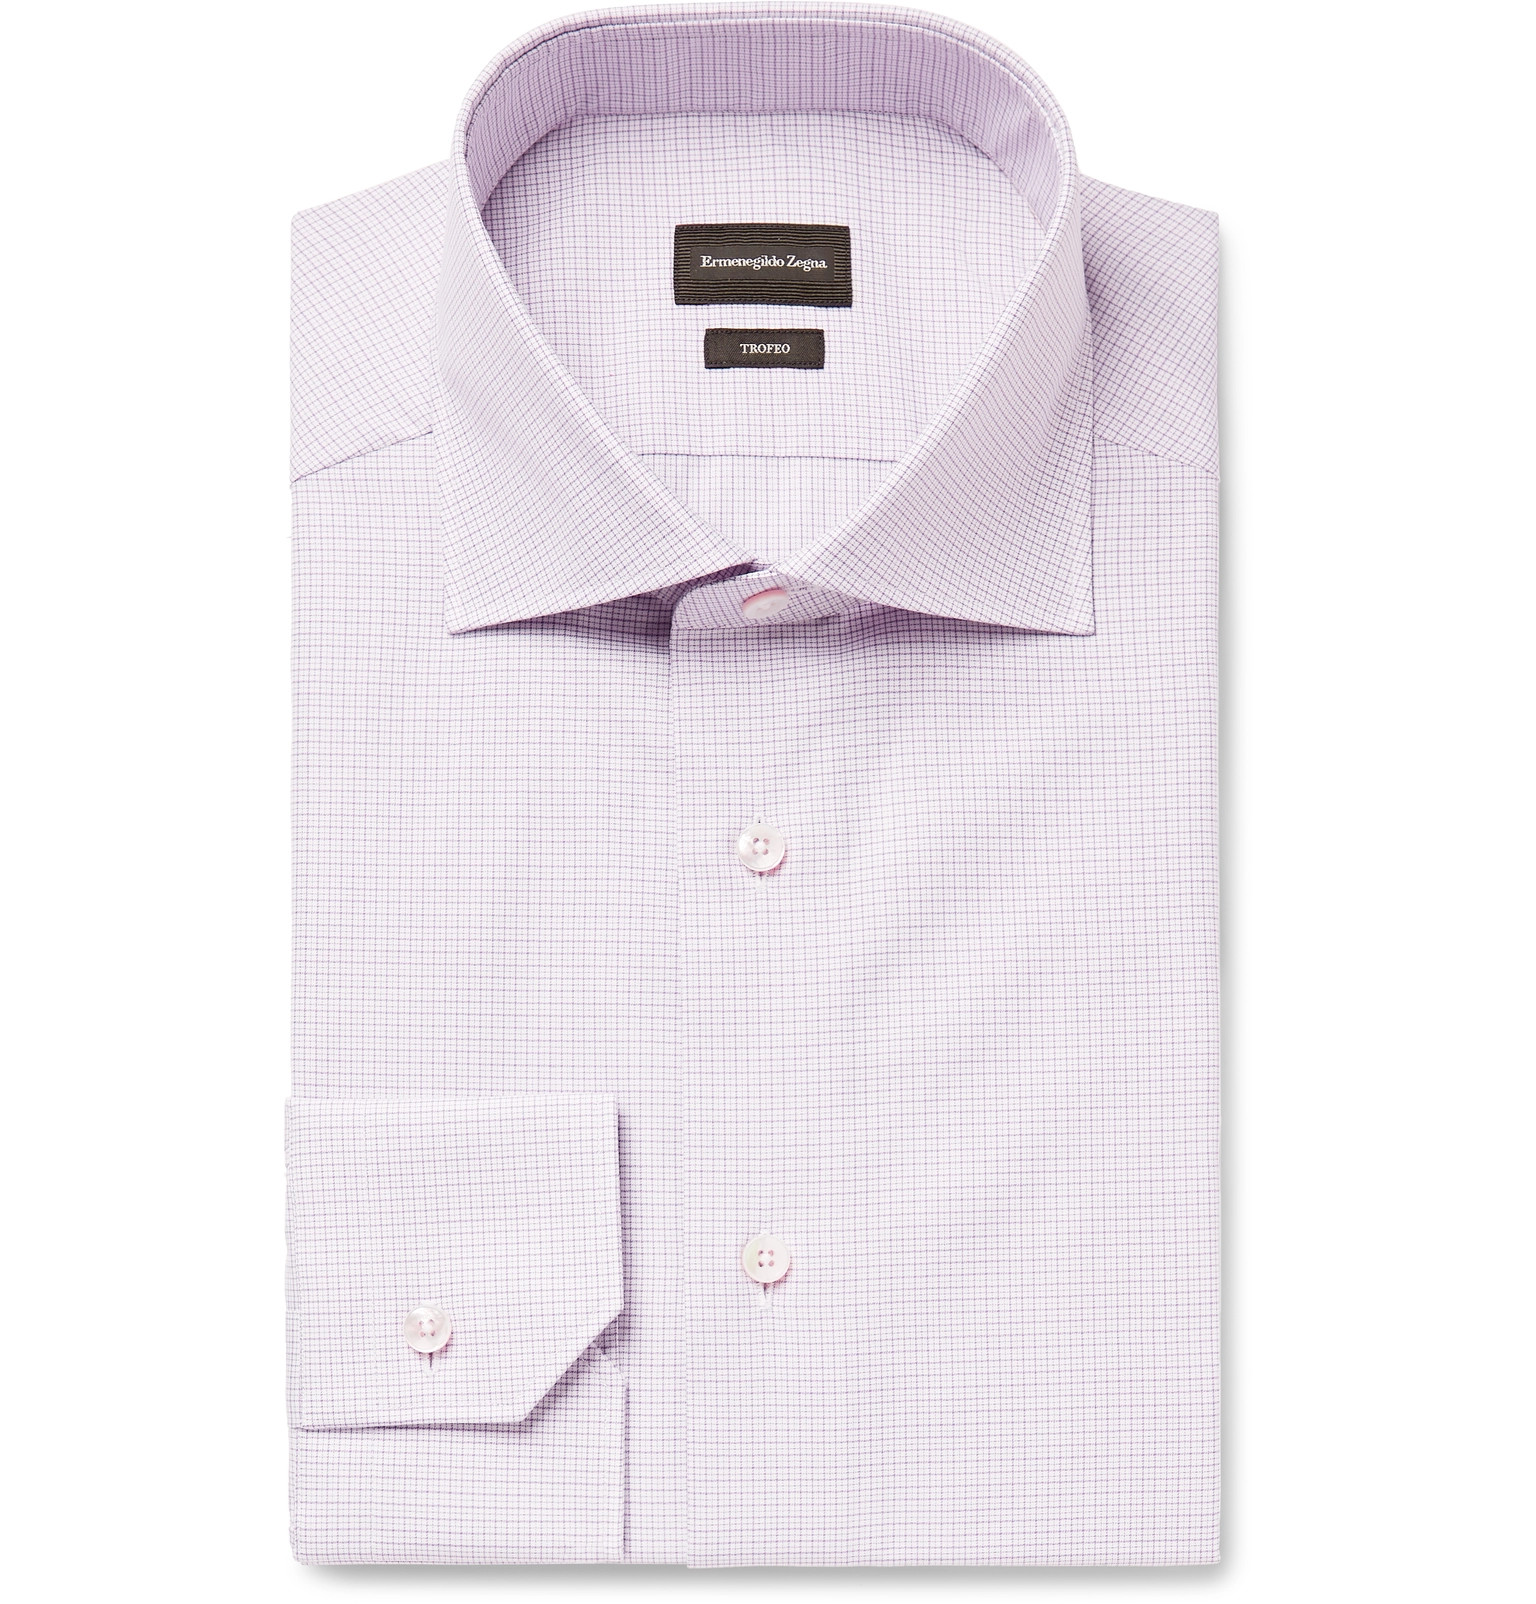 5faf3b71 Ermenegildo Zegna - Grape Slim-Fit Cutaway-Collar Checked Trofeo  Cotton-Poplin Shirt